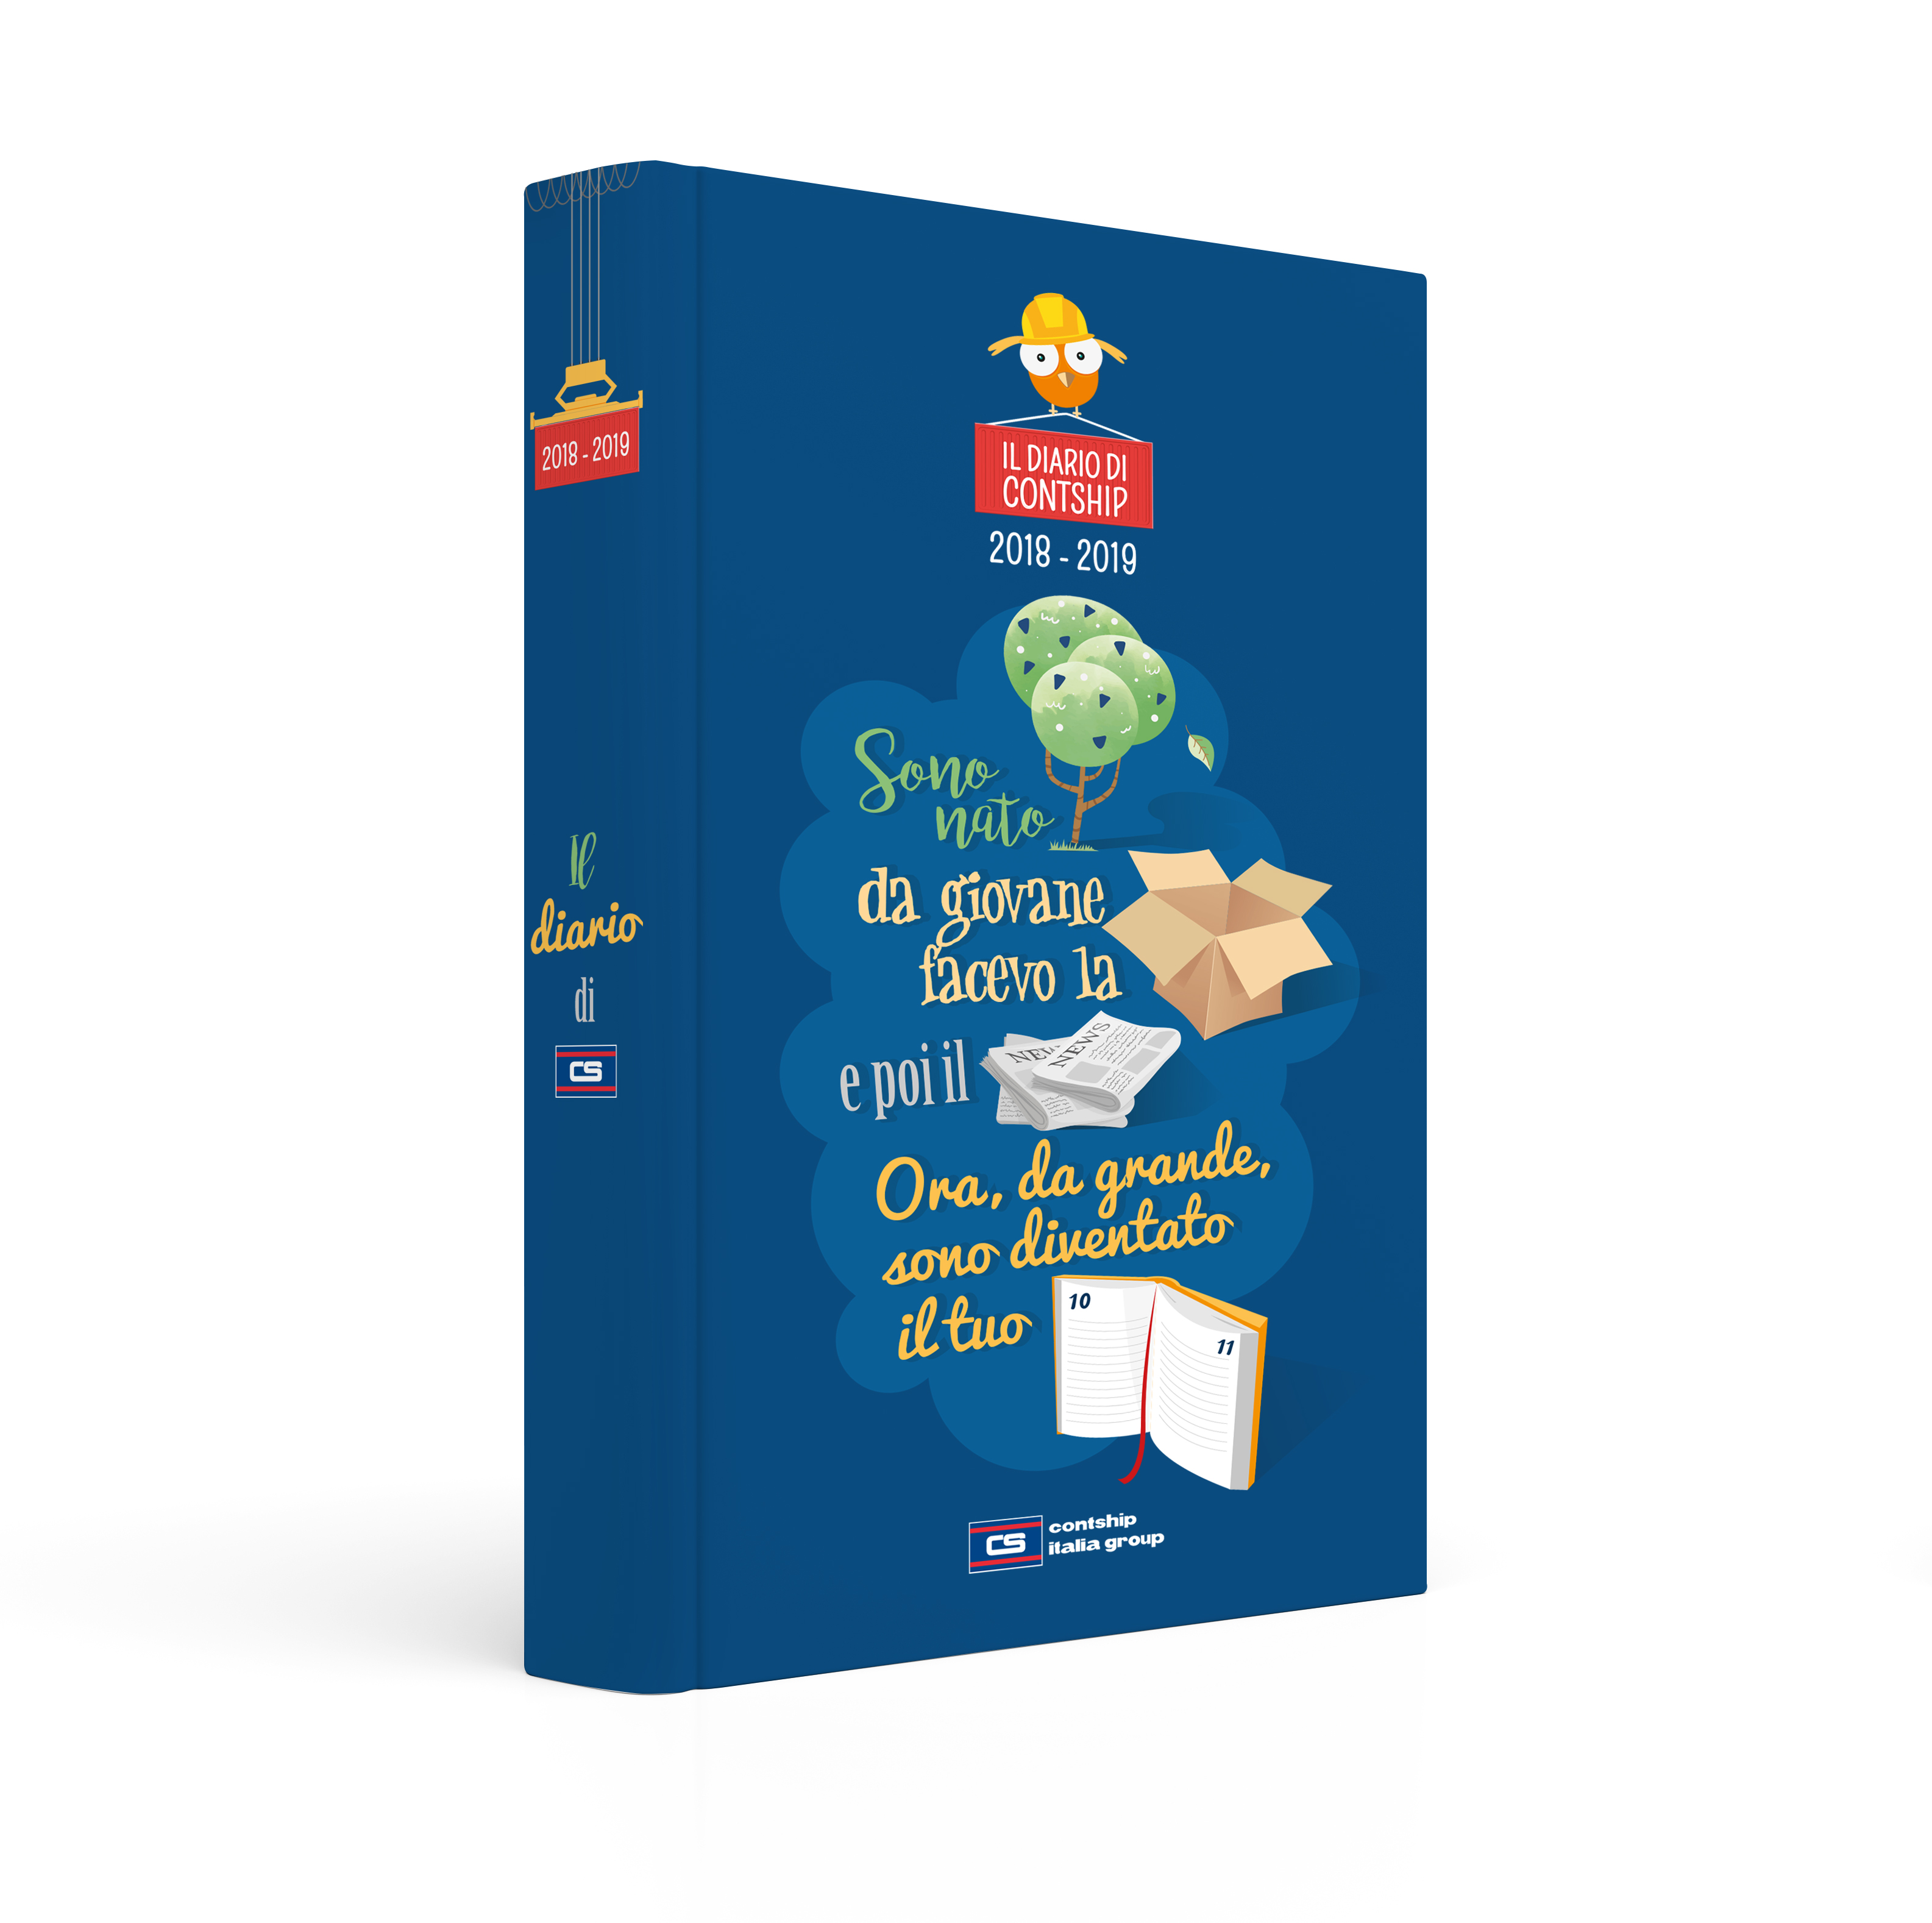 Thirteenth Edition of Contship Homework Diary | Contship